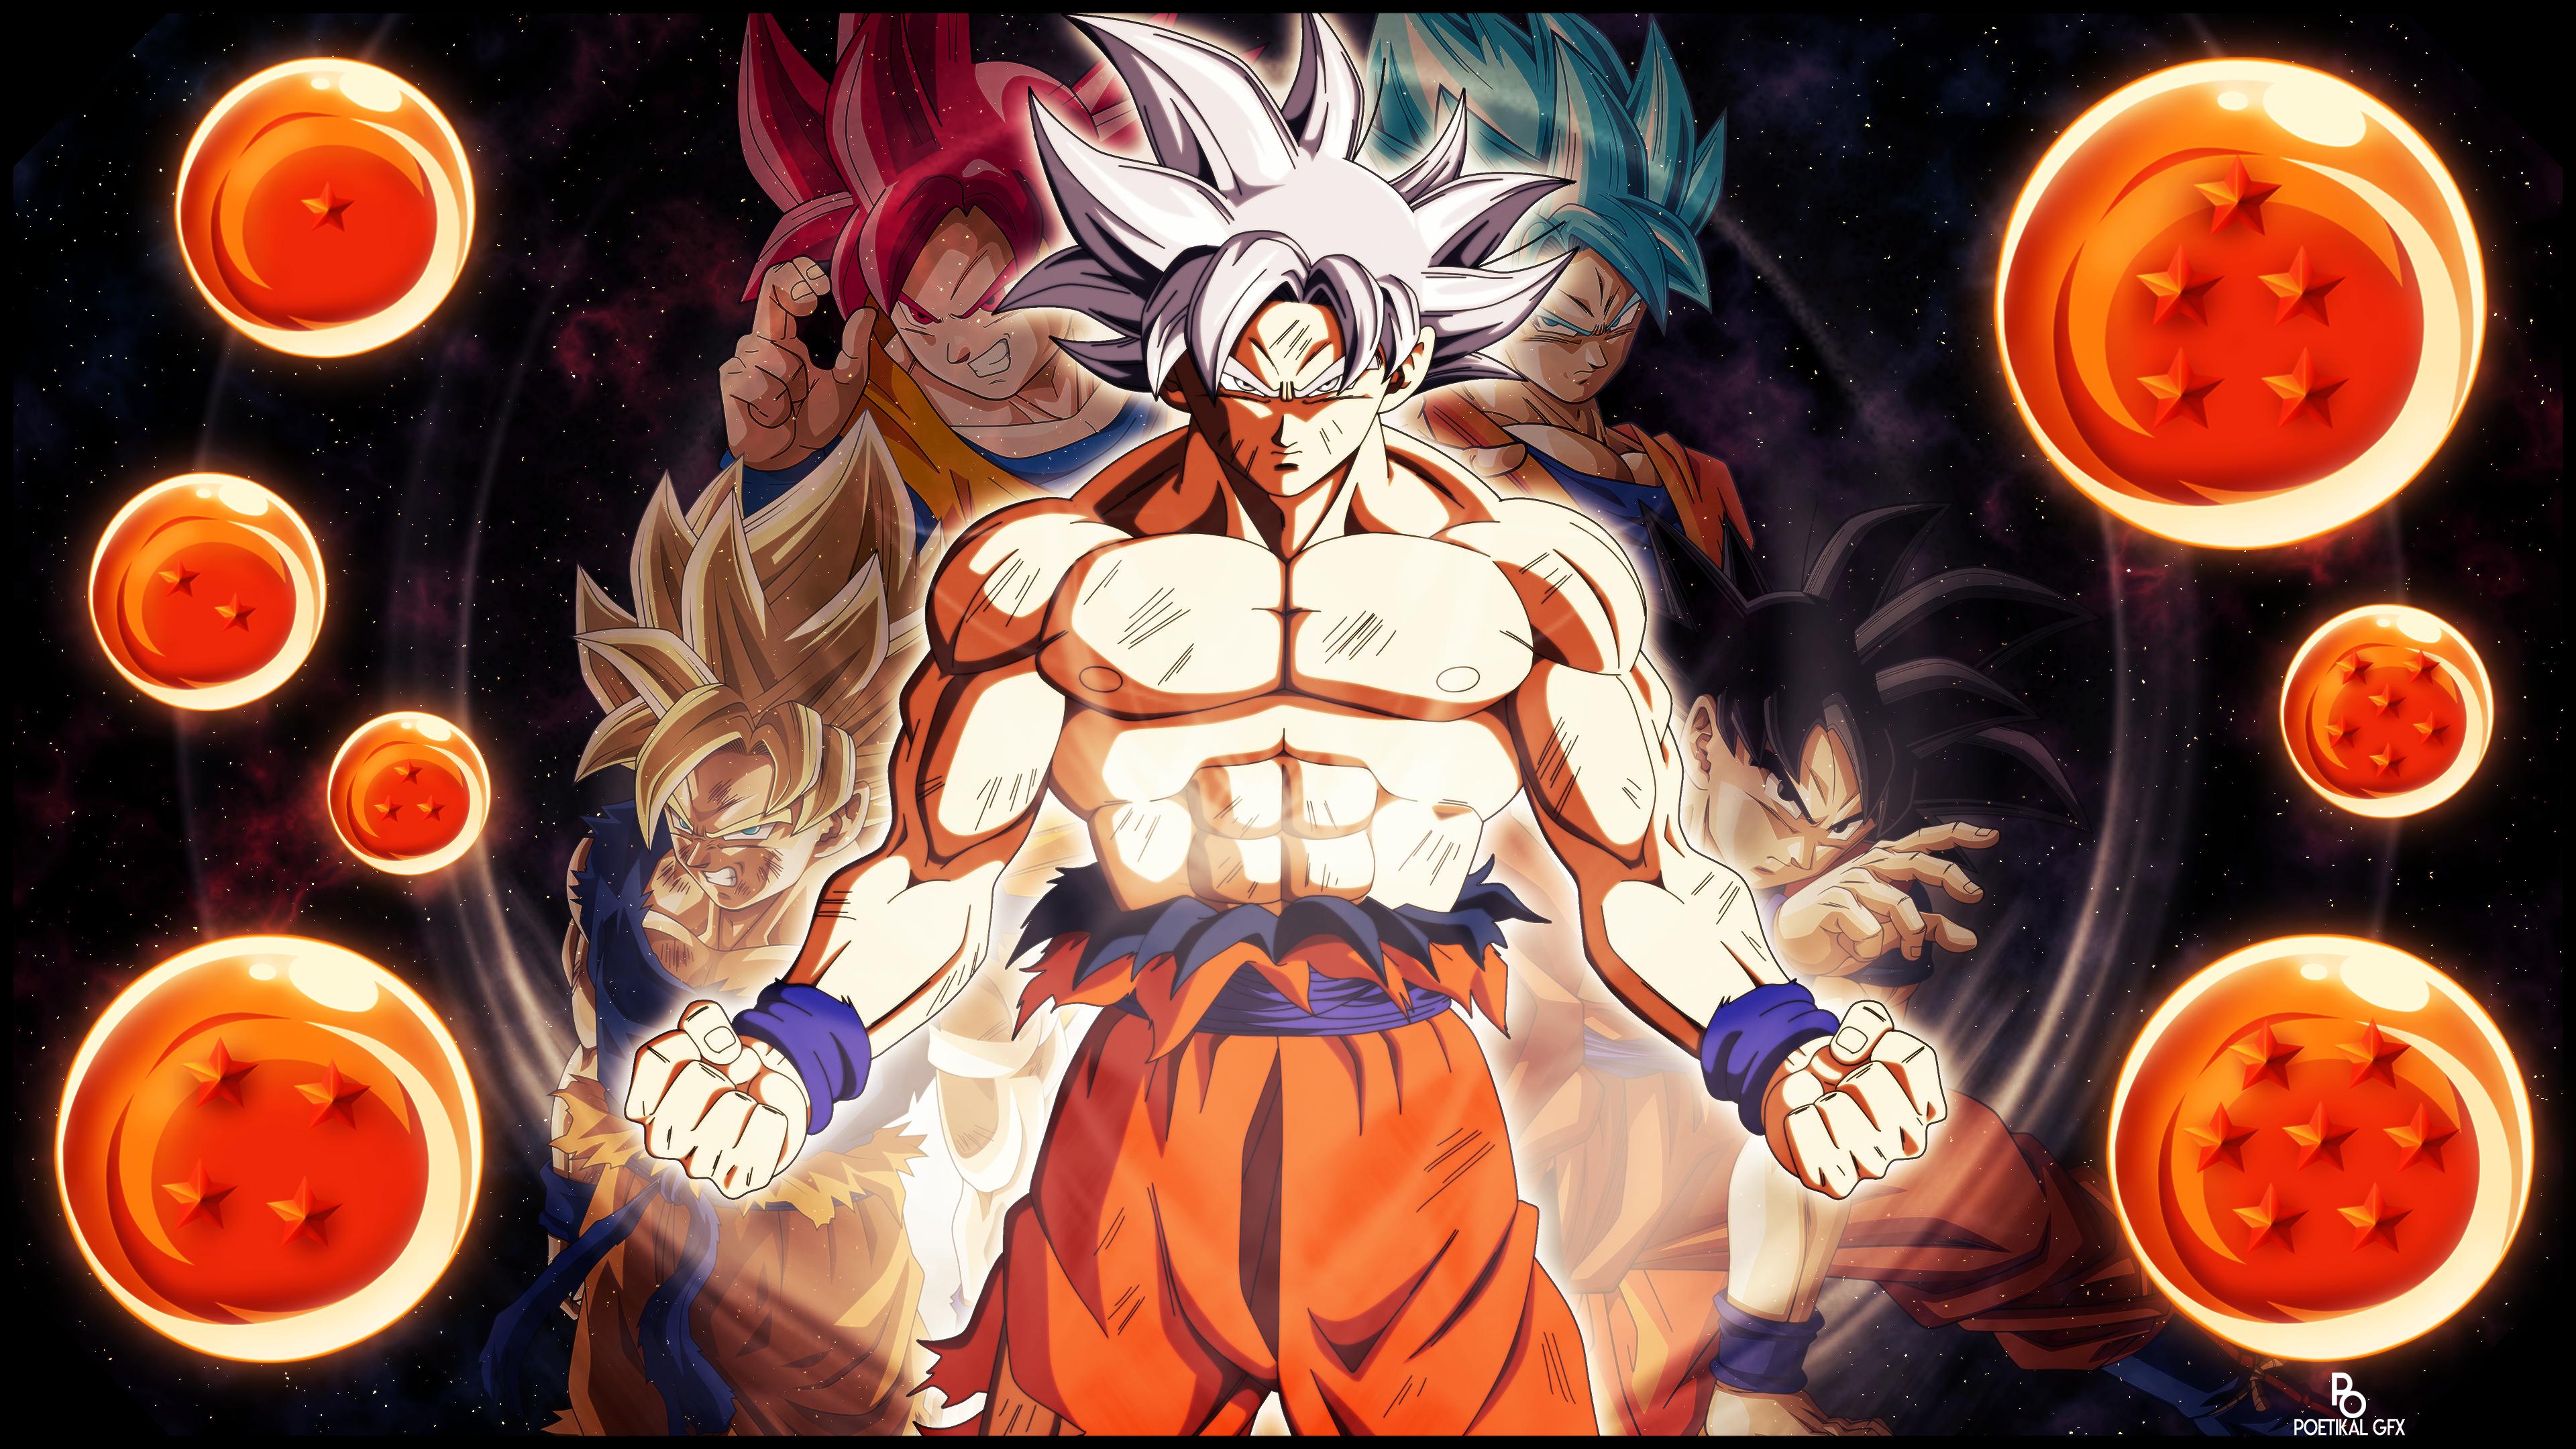 Mastered ultra instinct goku 4k wallpaper by poetikal on - Goku ultra instinct mastered wallpaper ...